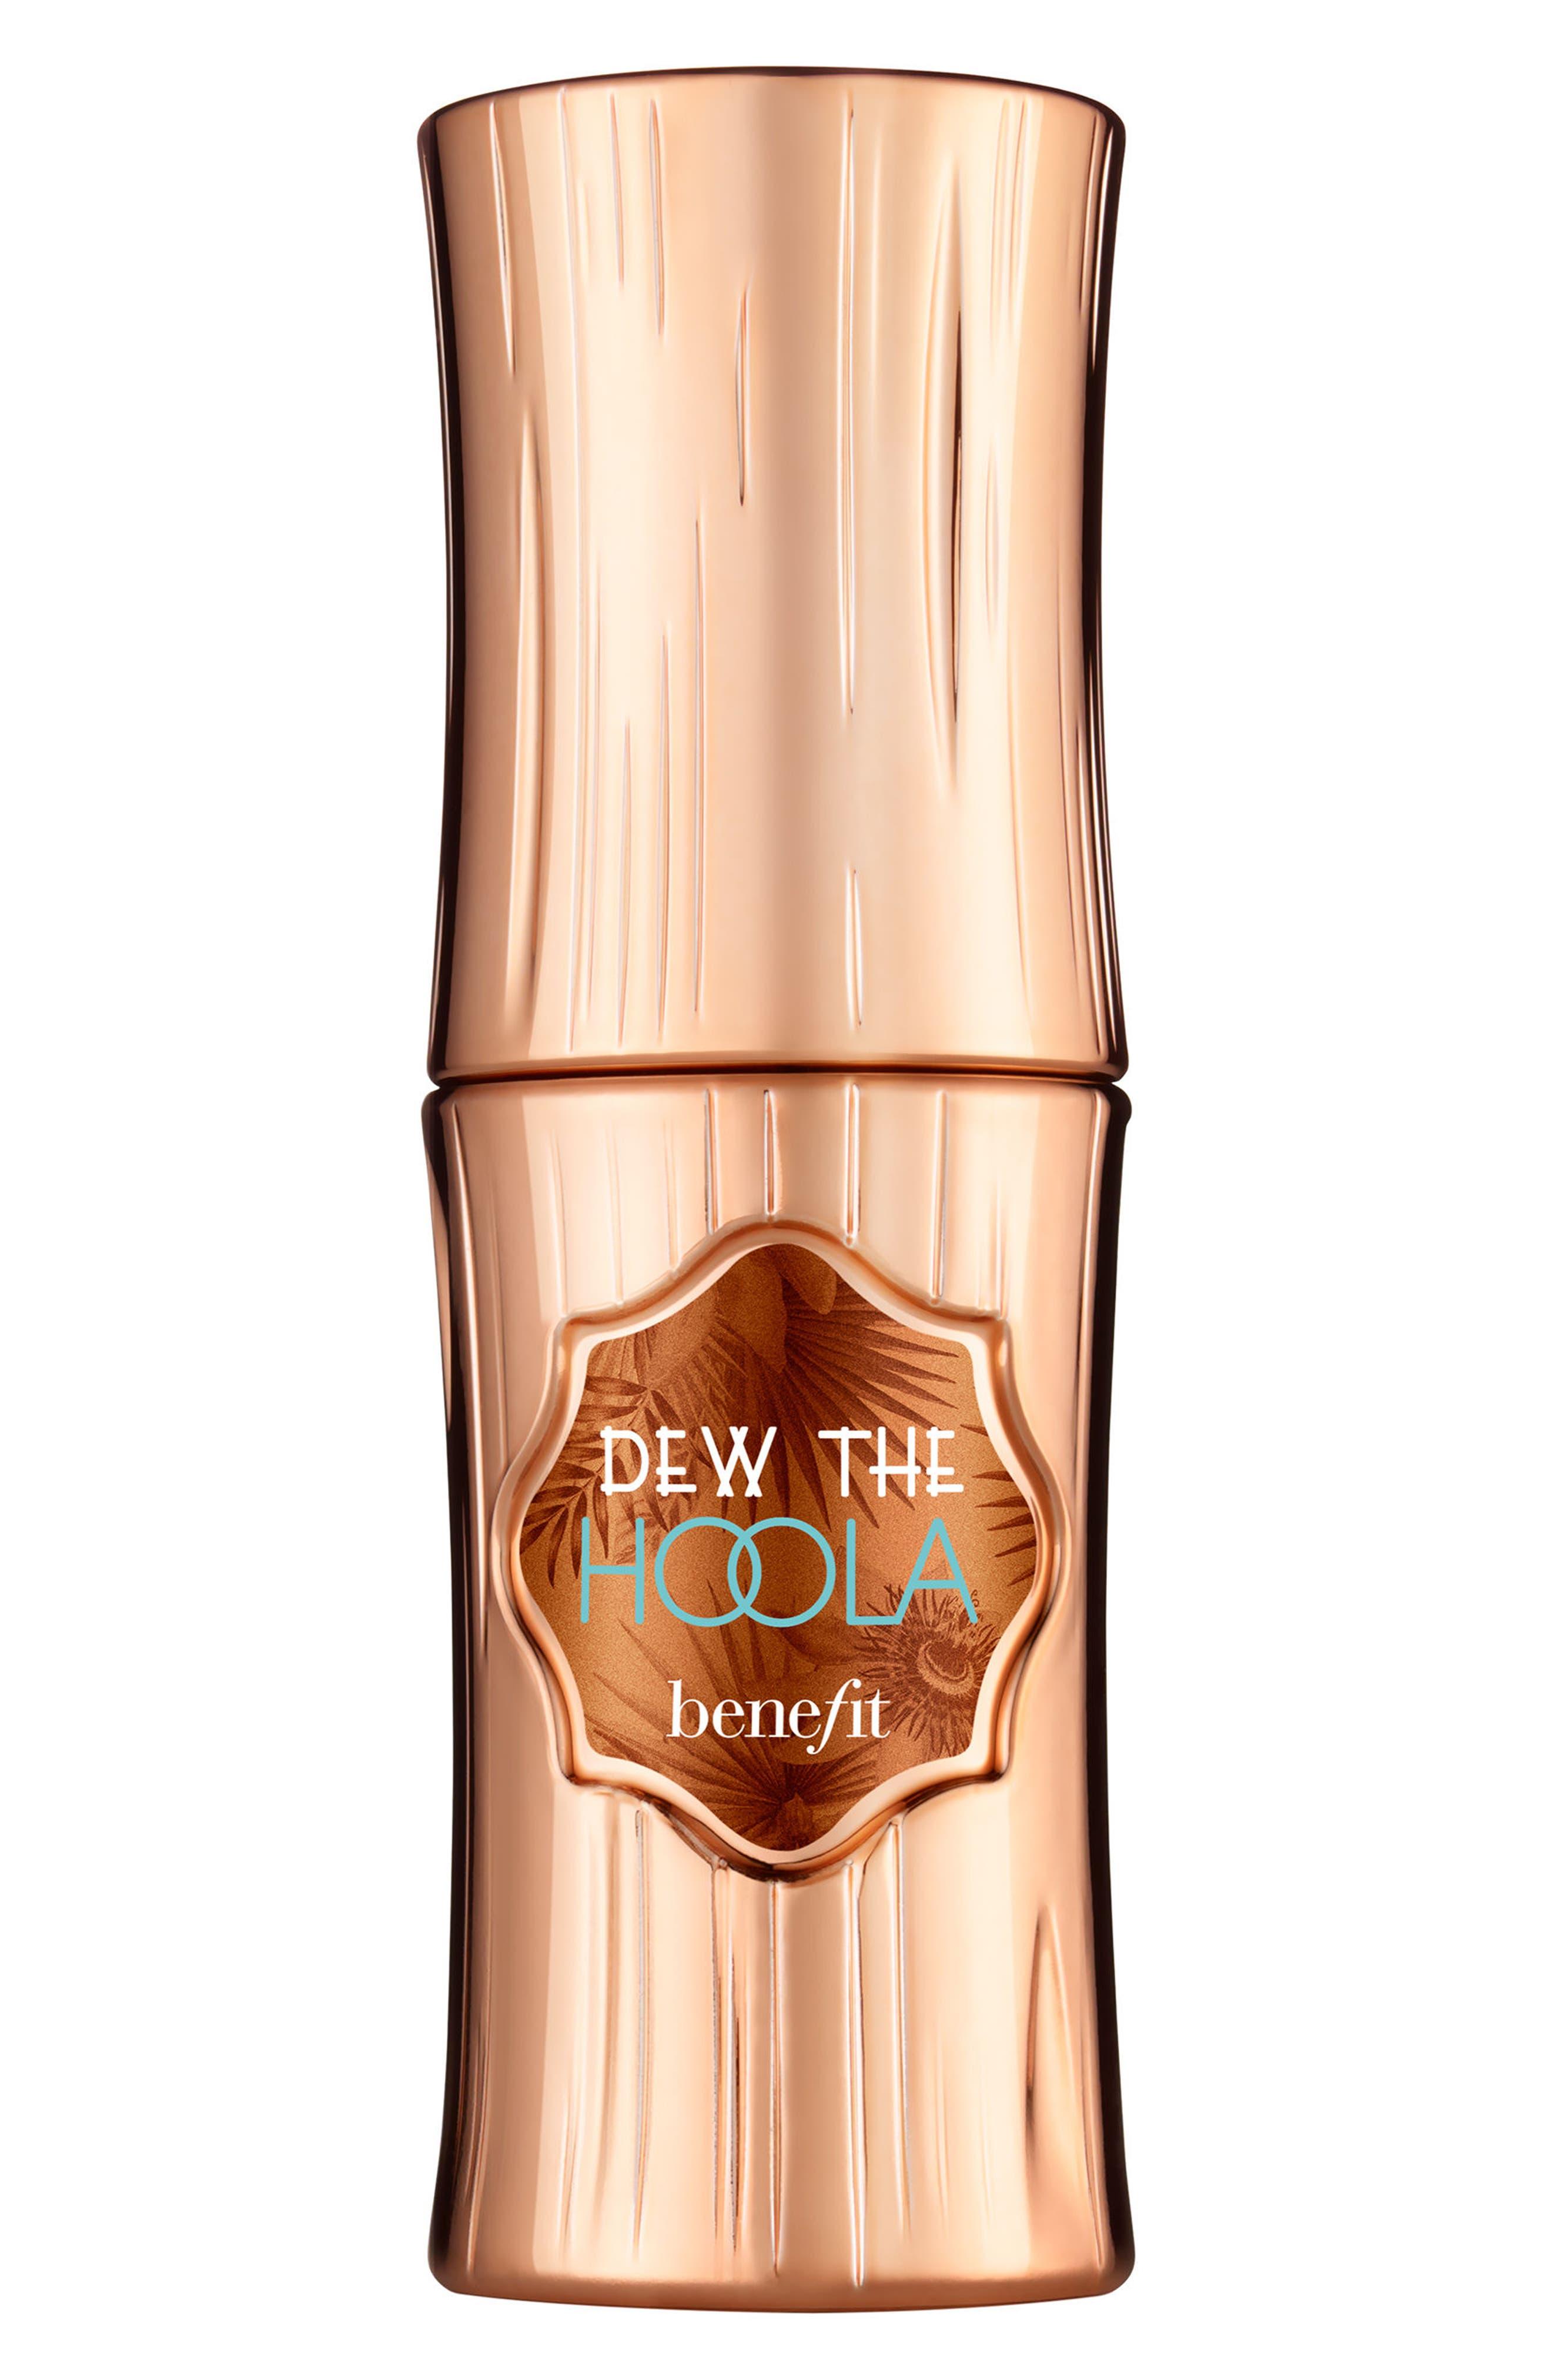 Benefit Dew the Hoola Matte Liquid Bronzer,                         Main,                         color, BRONZE